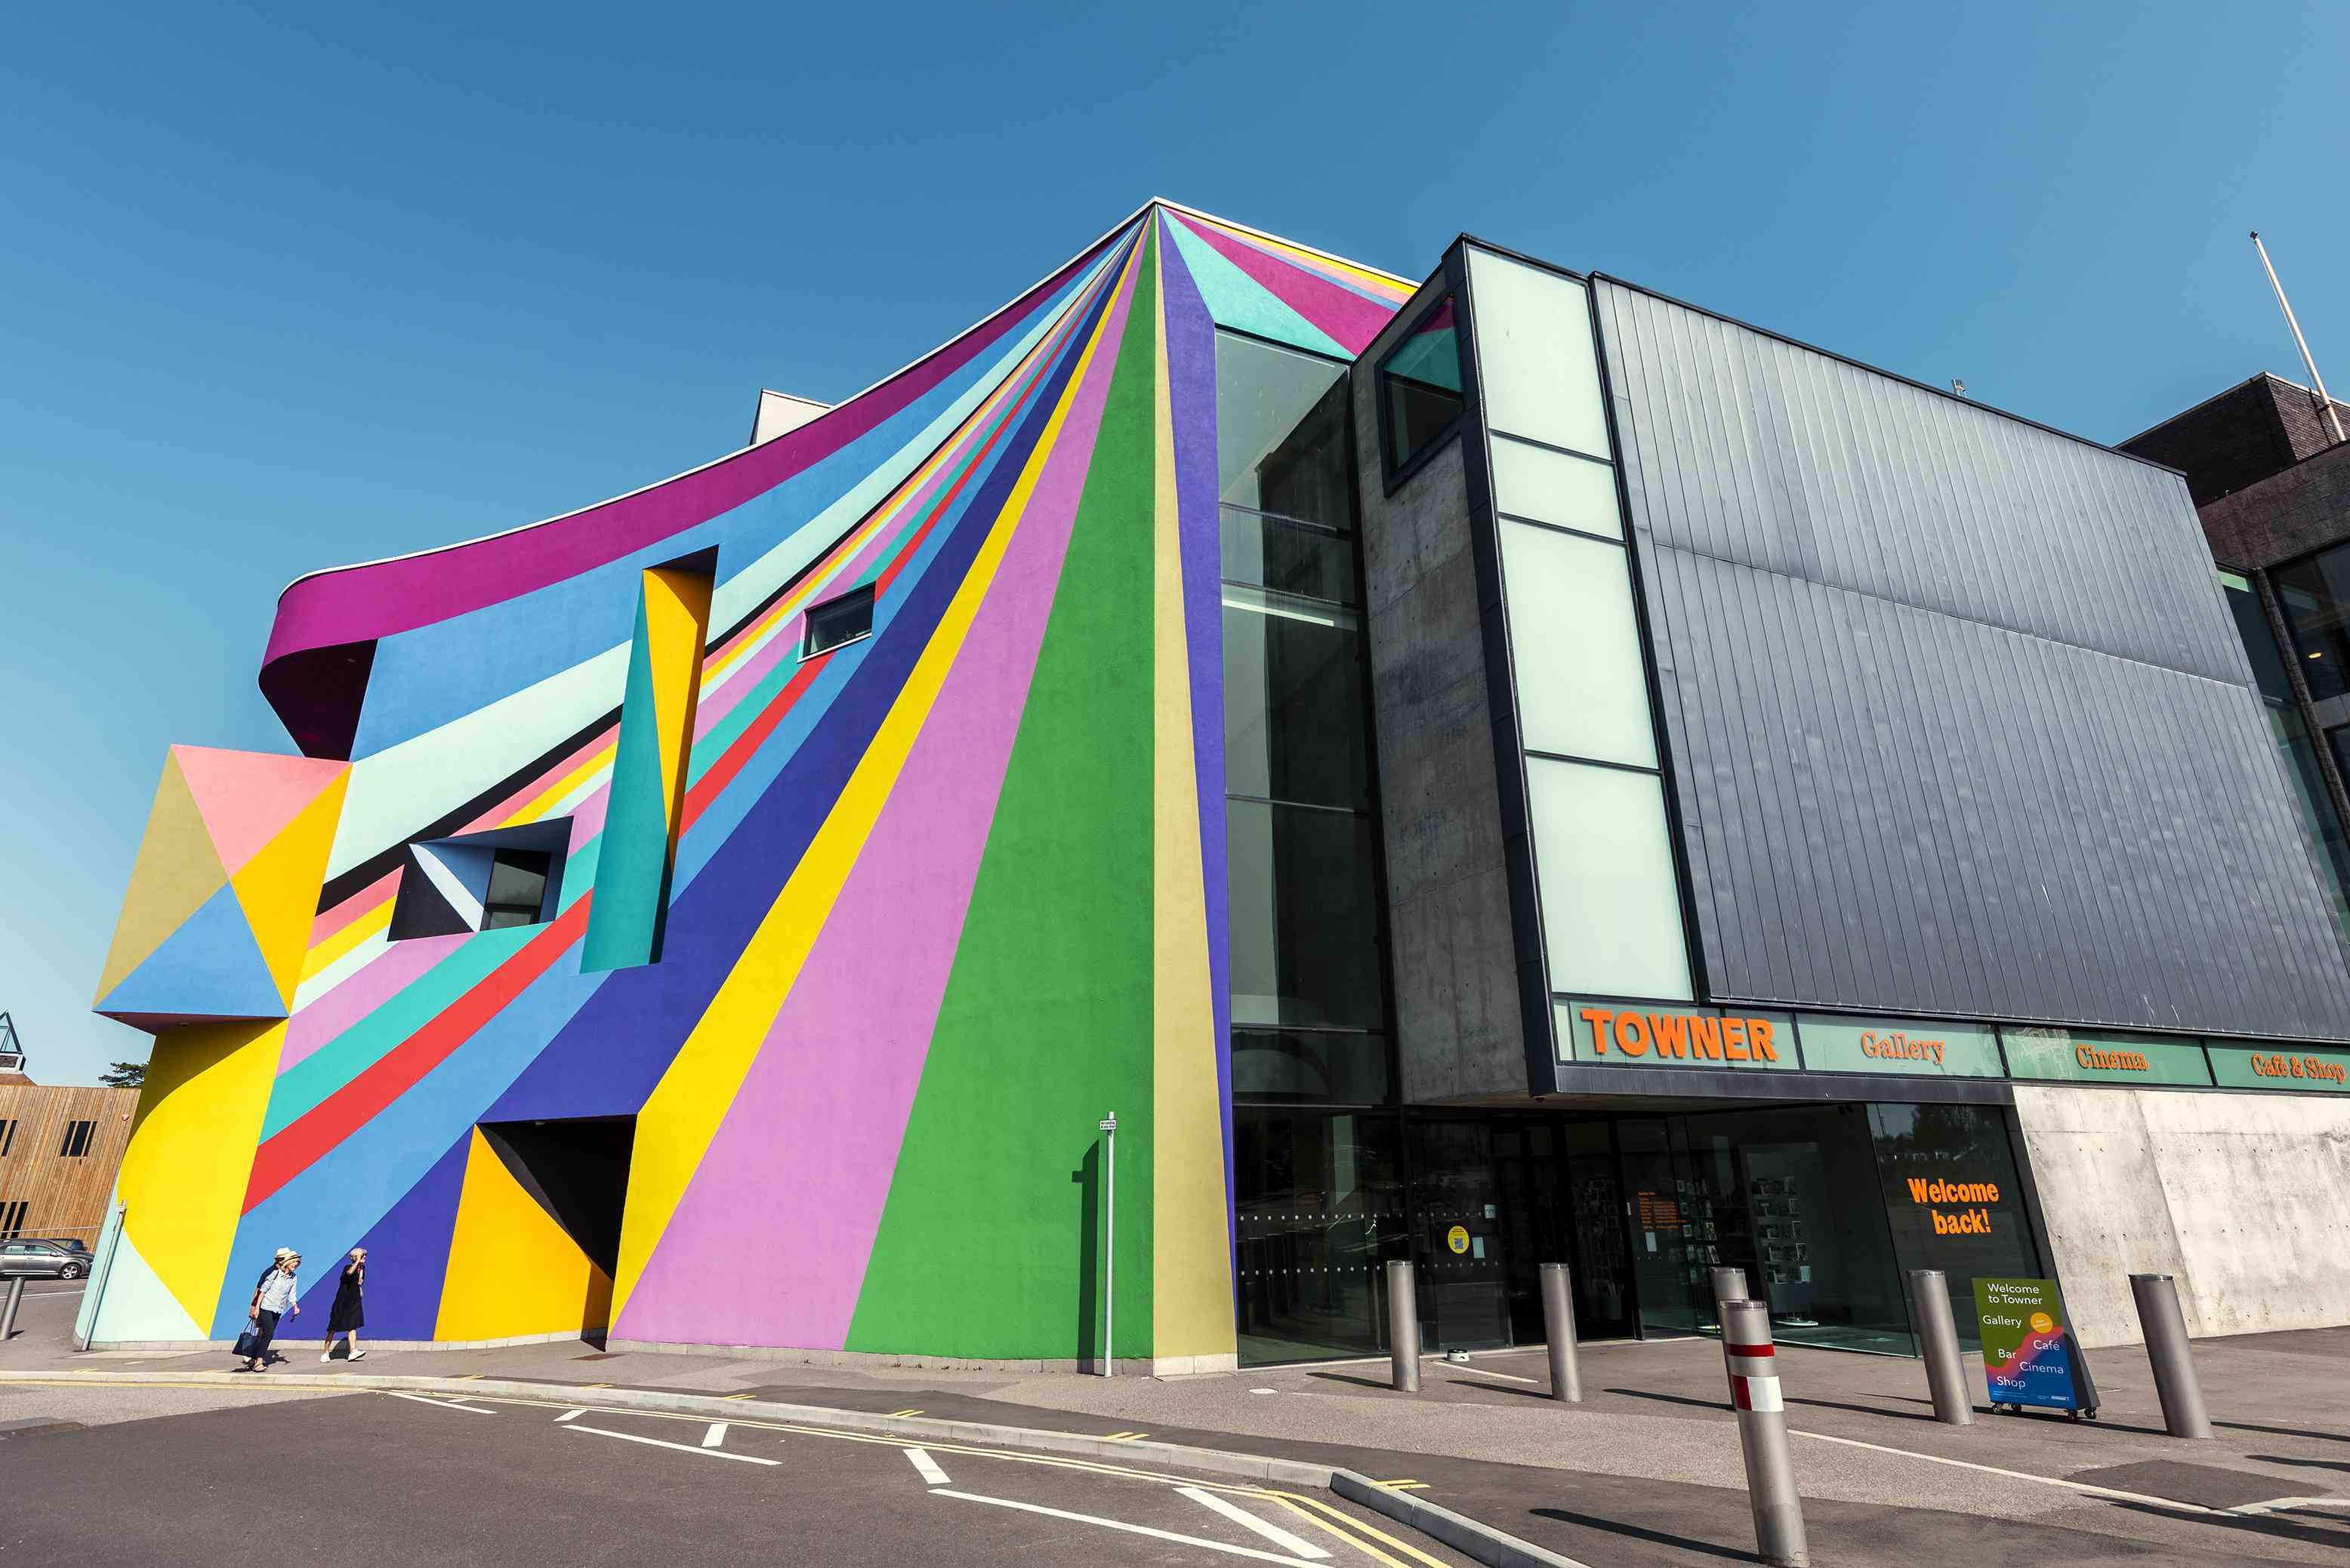 Towner Art Gallery in Eastbourne